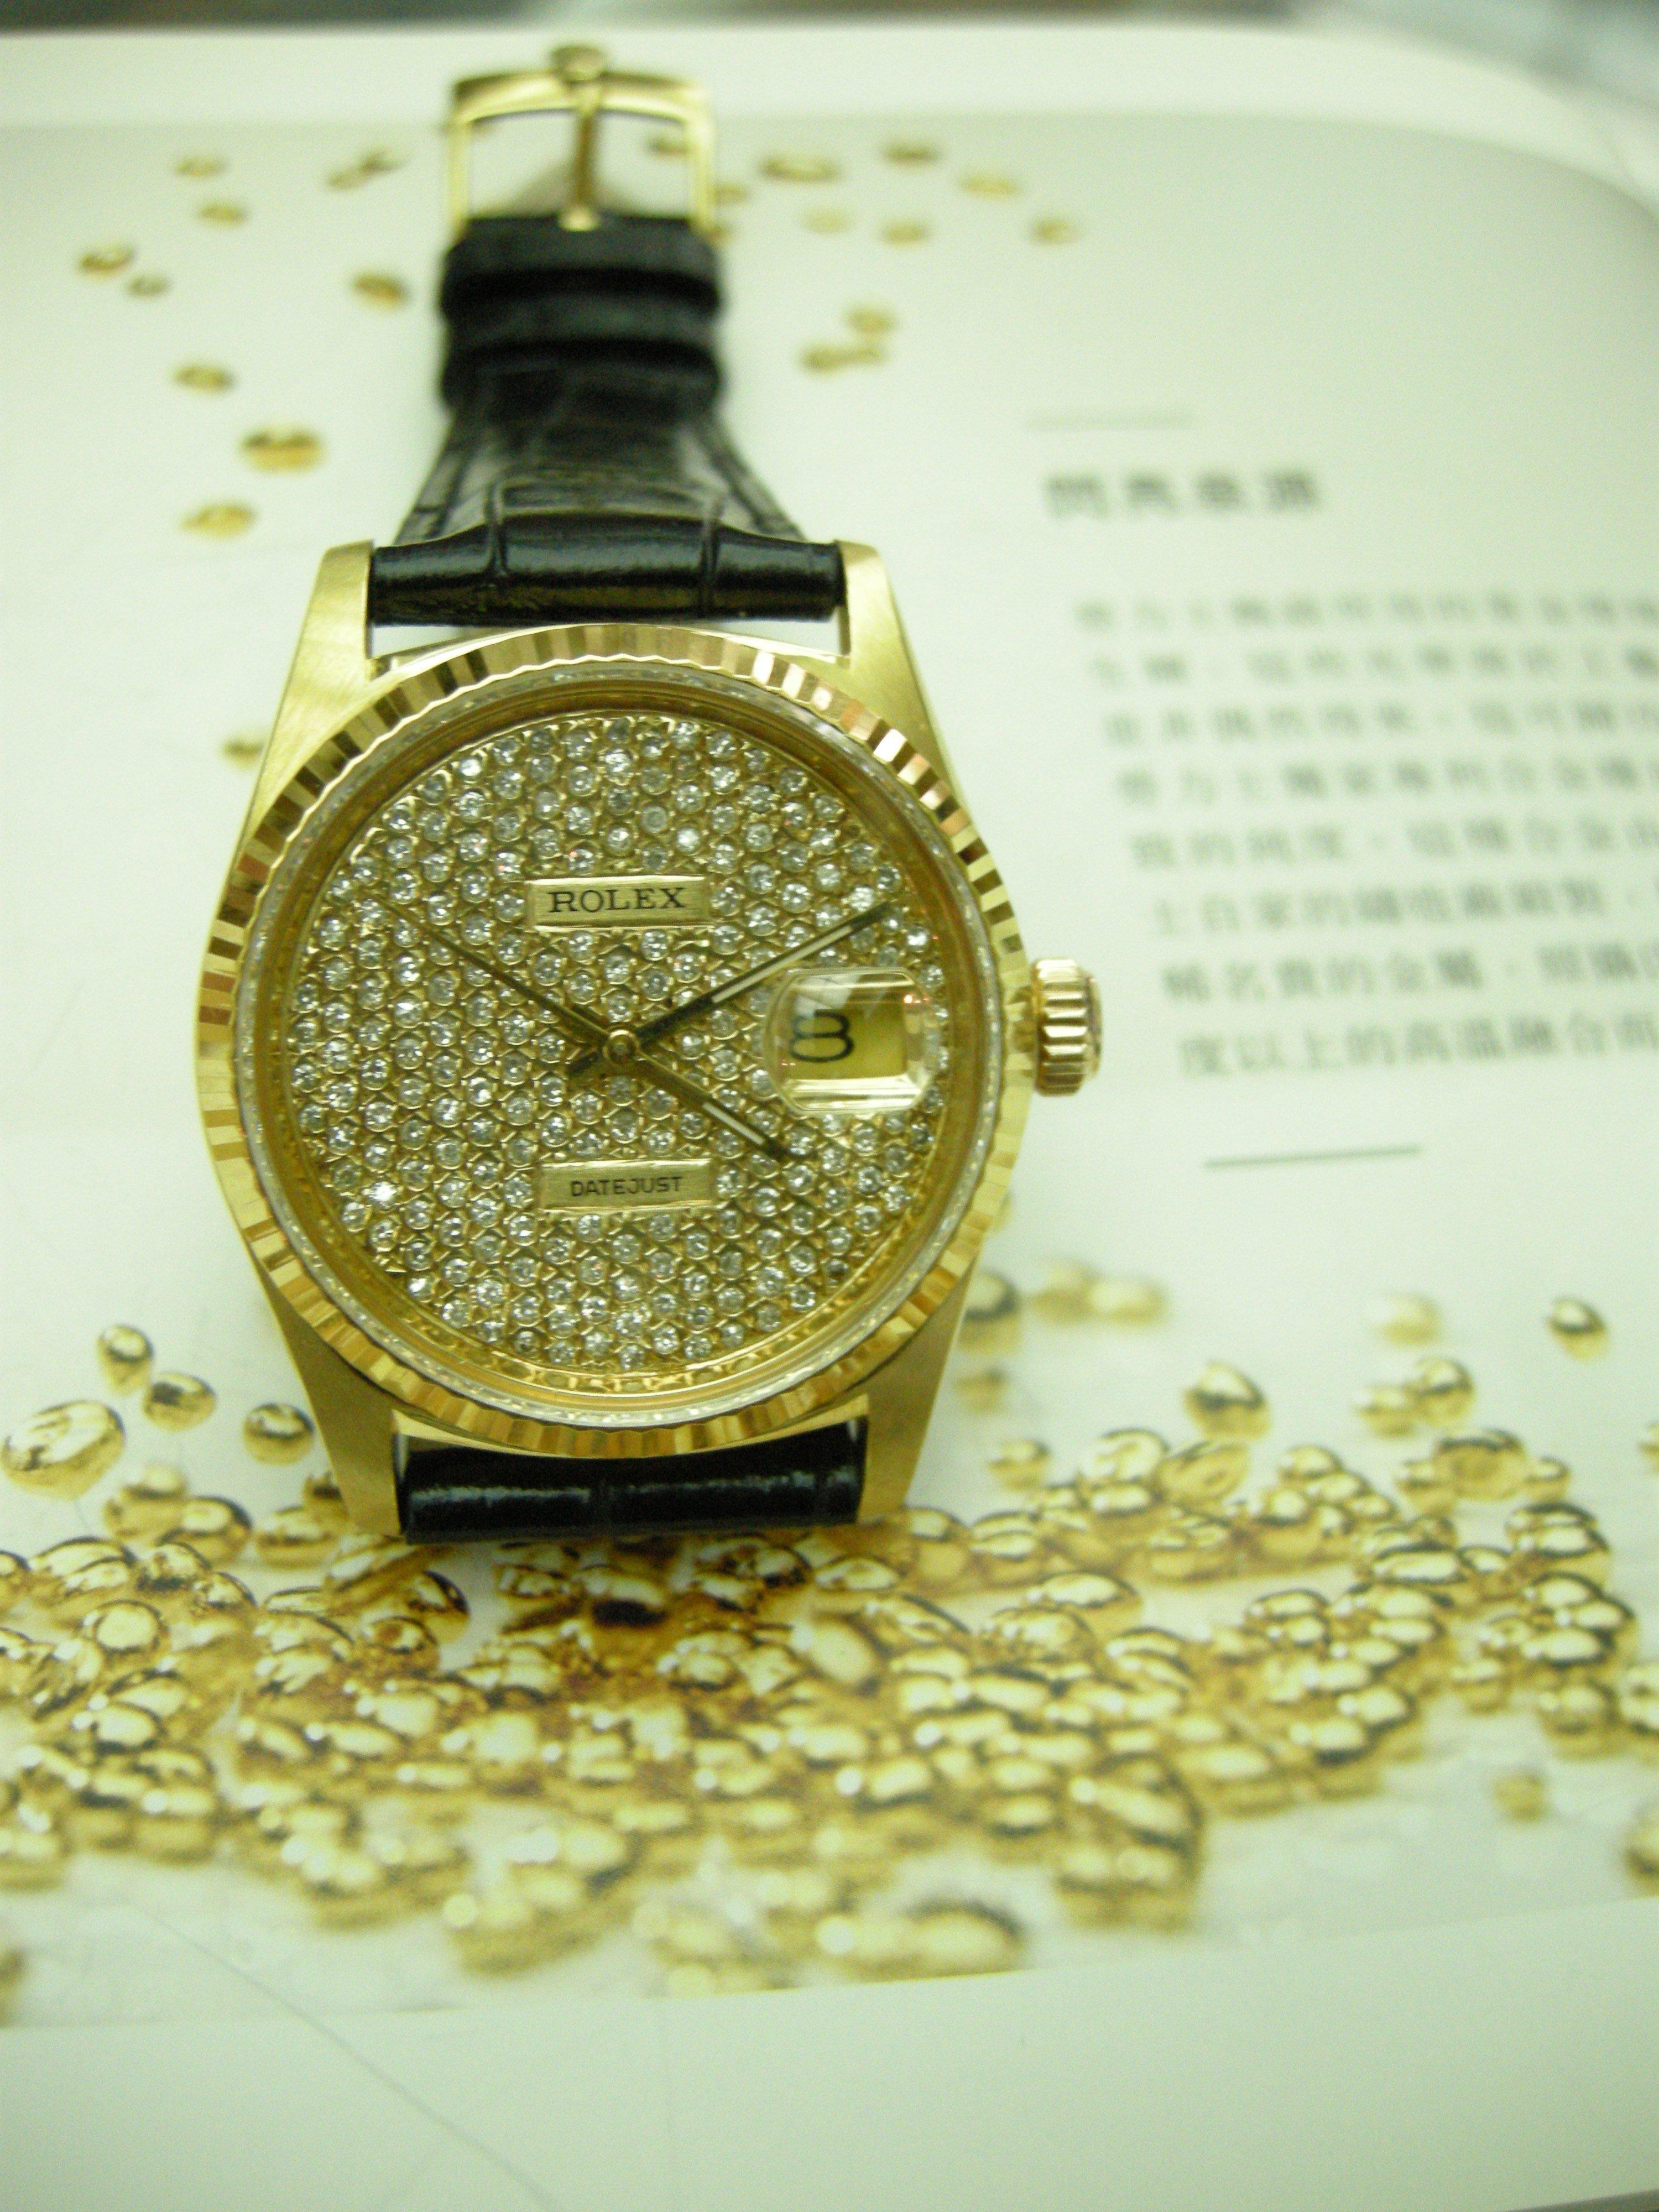 ROLEX  勞力士16018蠔式款(18K金壳特定鑄造) 滿天星全鑽面 品相極美